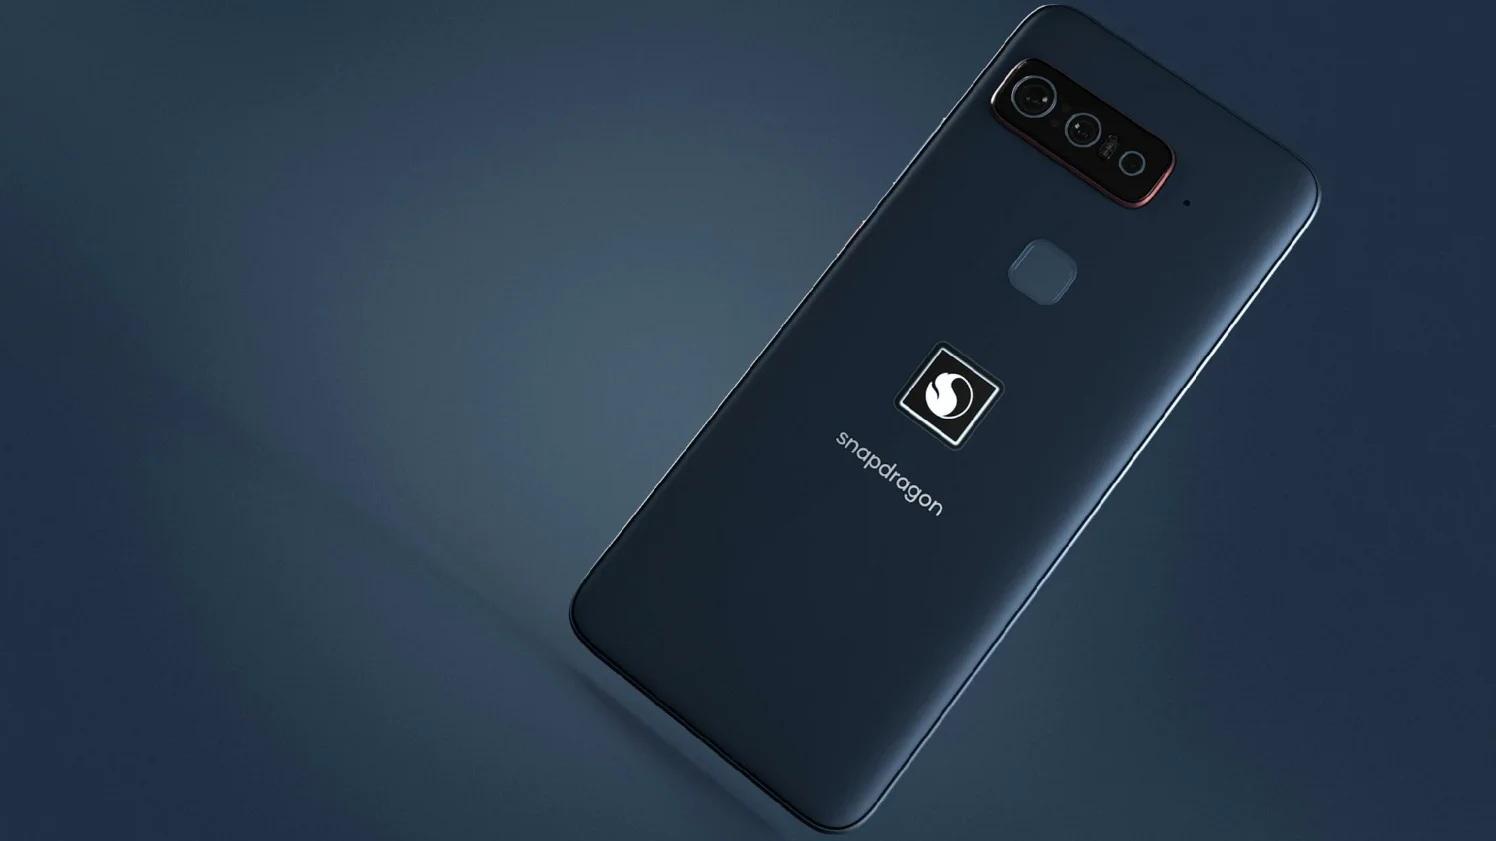 Smartphone Qualcomm phone